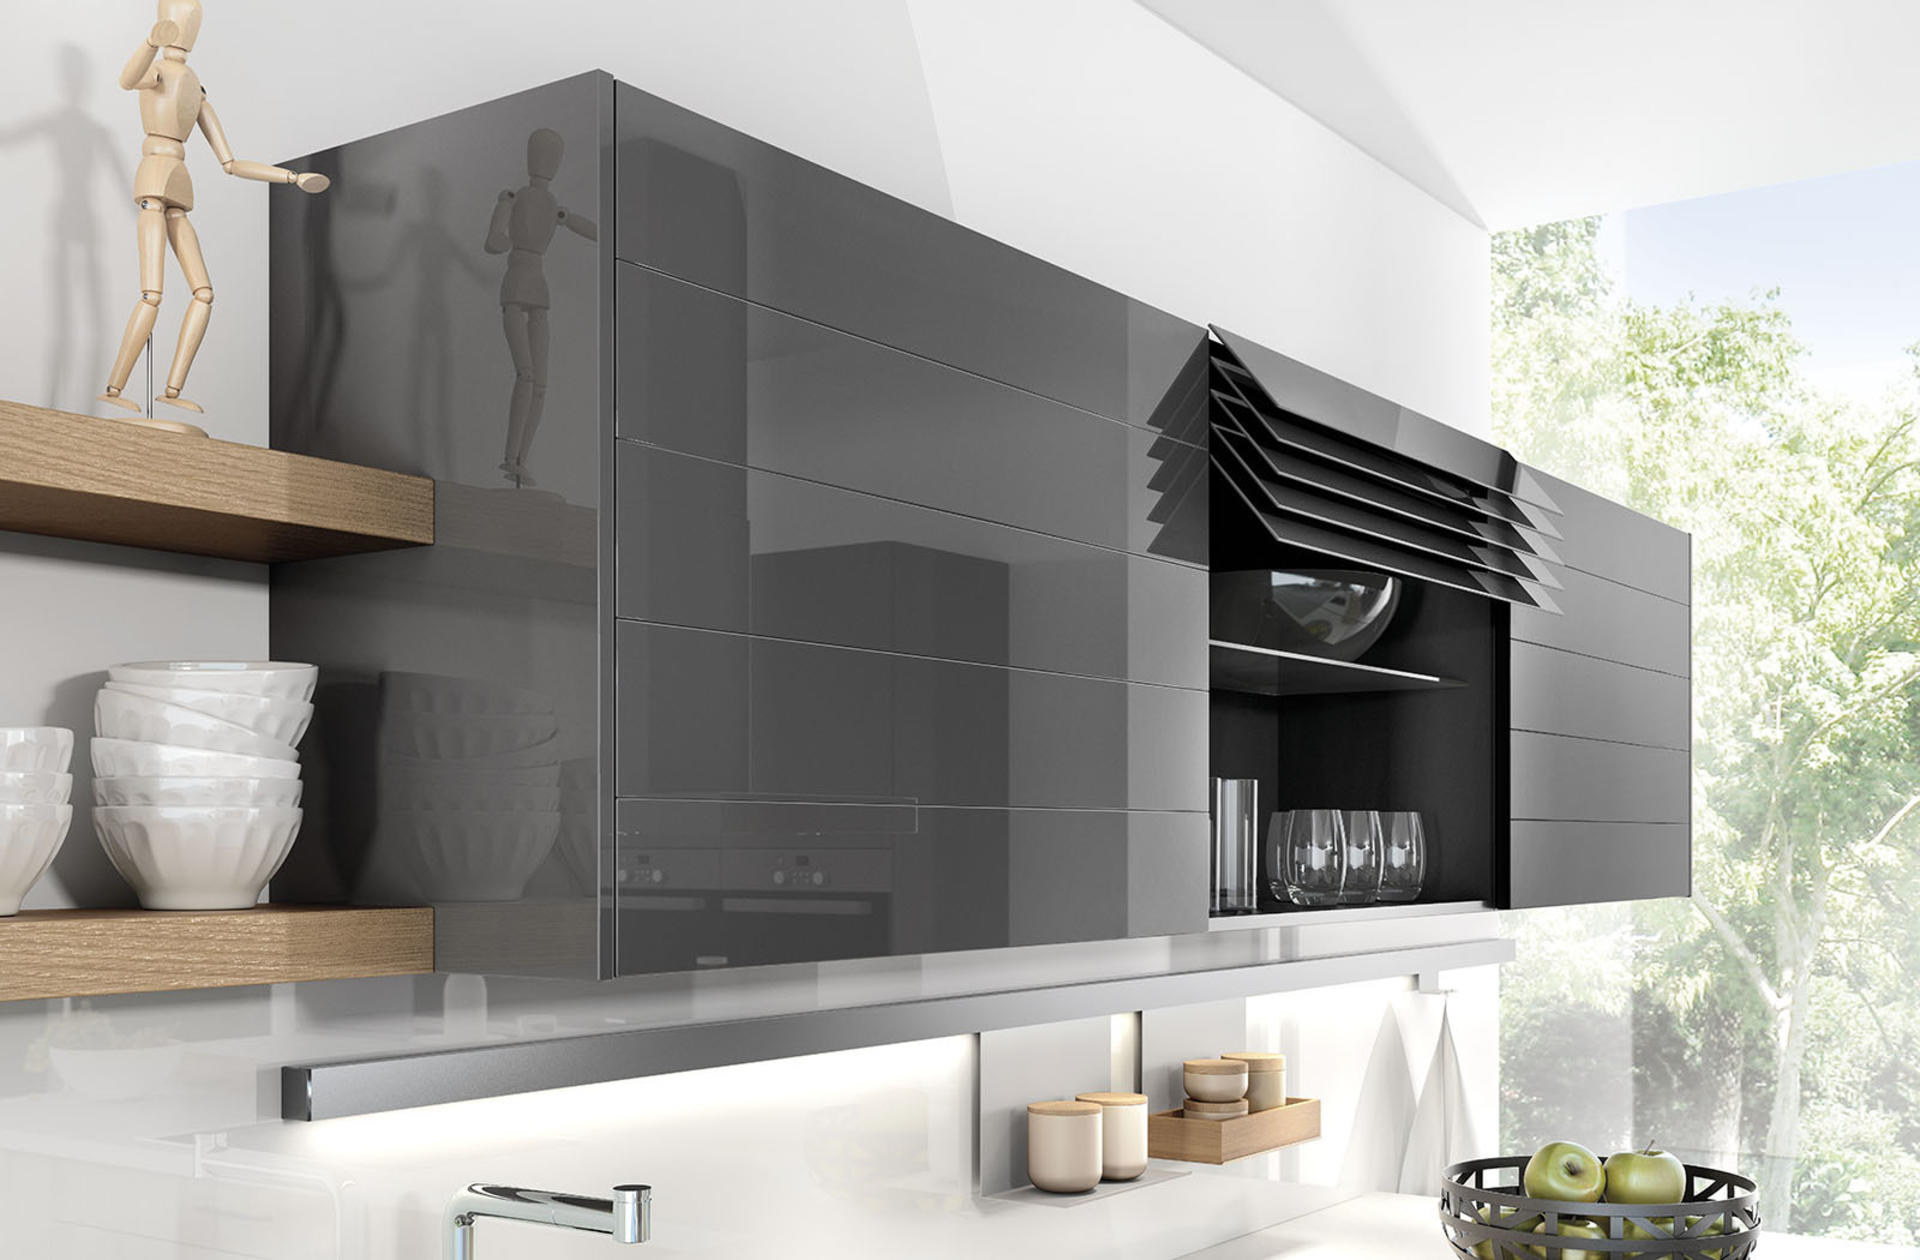 Кухни Häcker, Provence ash | Lava grey - 1095 | 1080, фото 2